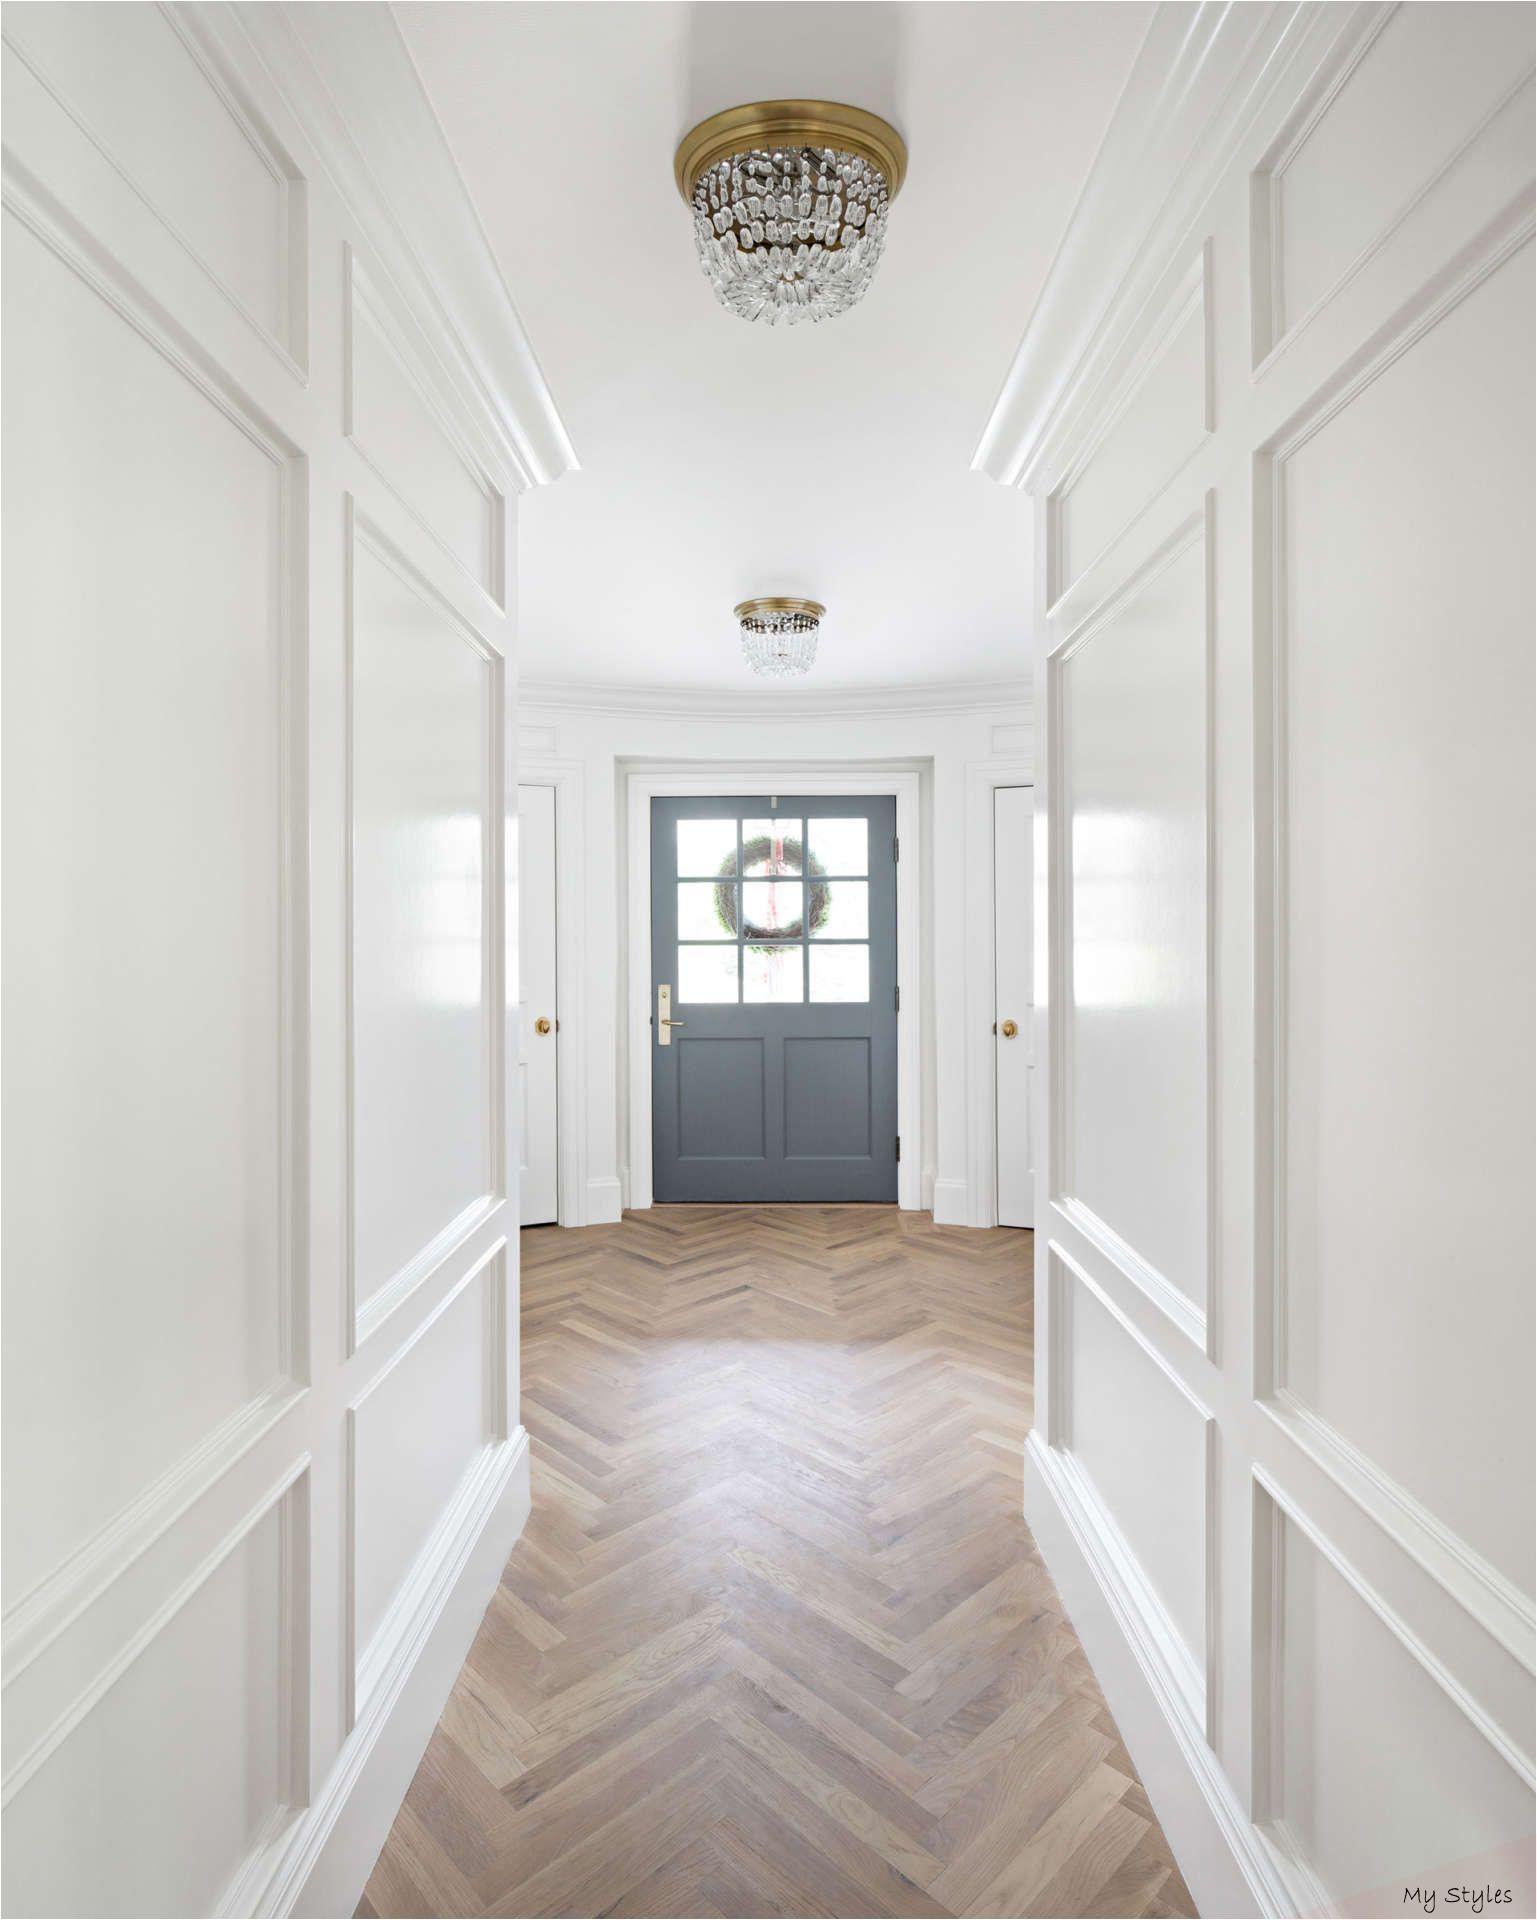 10 Gorgeous Timeless Design Ideas The Fox Group Hello Lovely Project Home In 2020 Herringbone Wood Floor Herringbone Floor Simply White Benjamin Moore